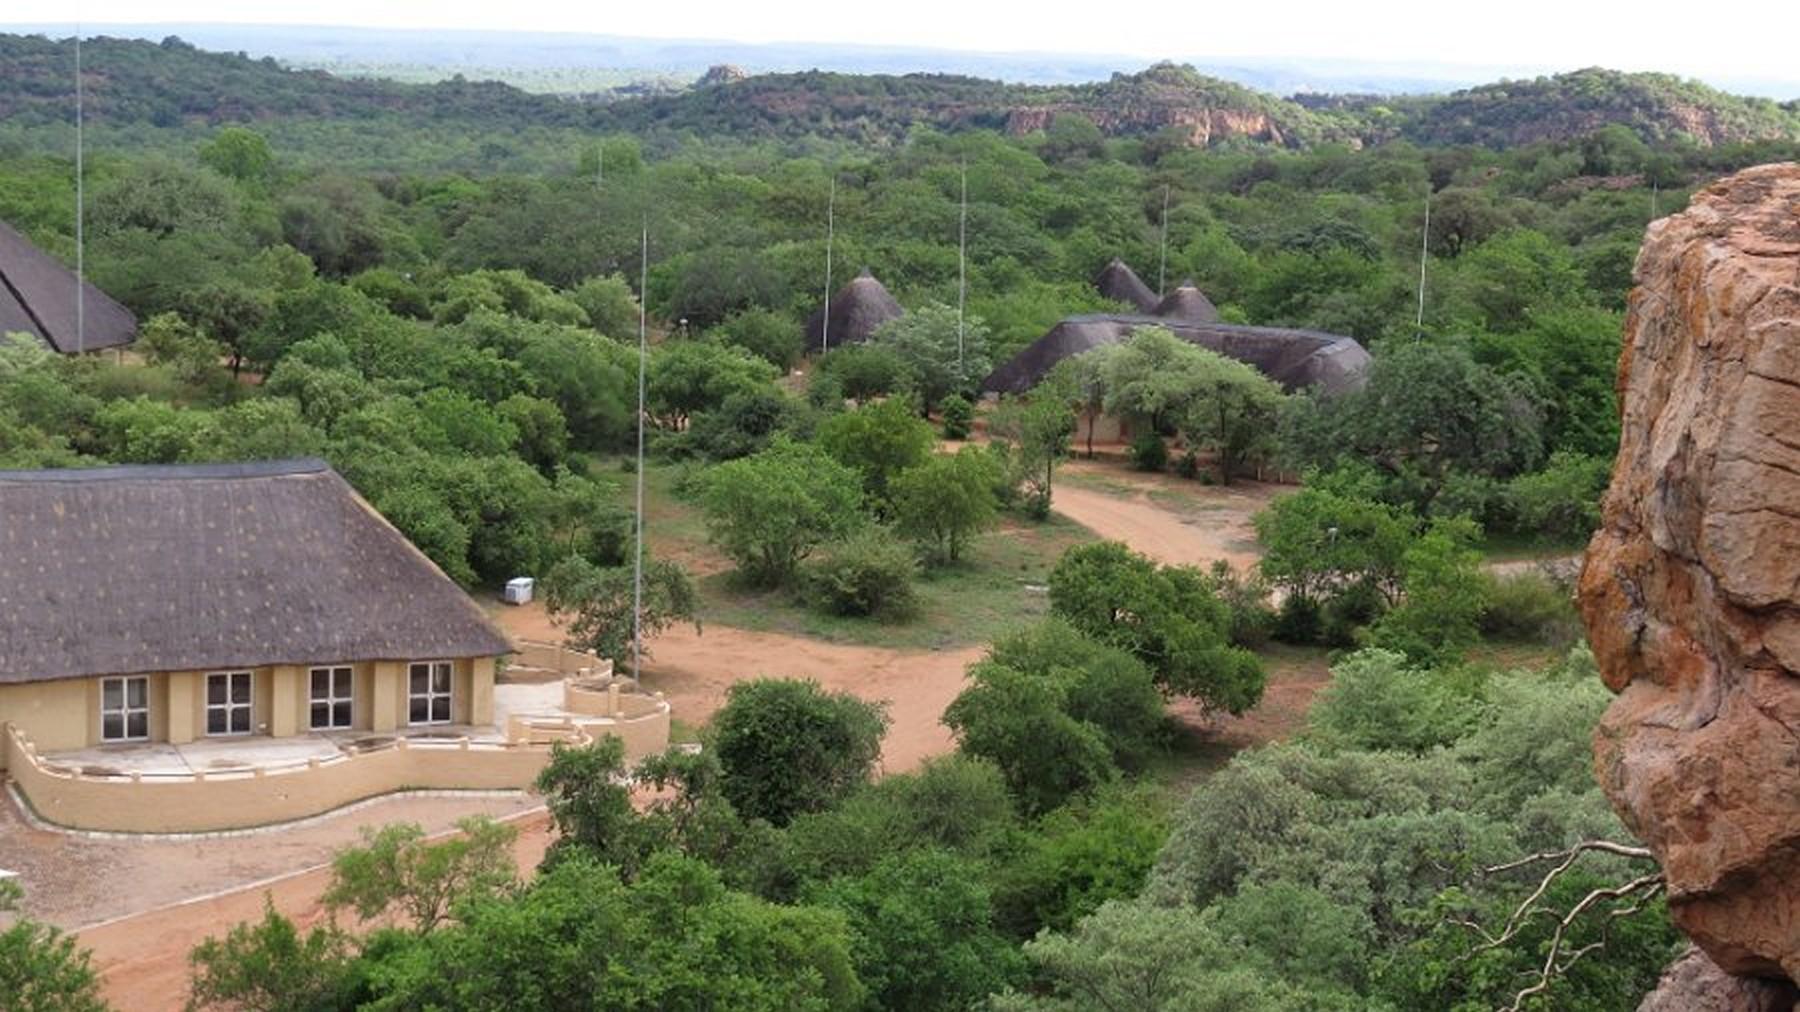 Awelani Lodge Overview